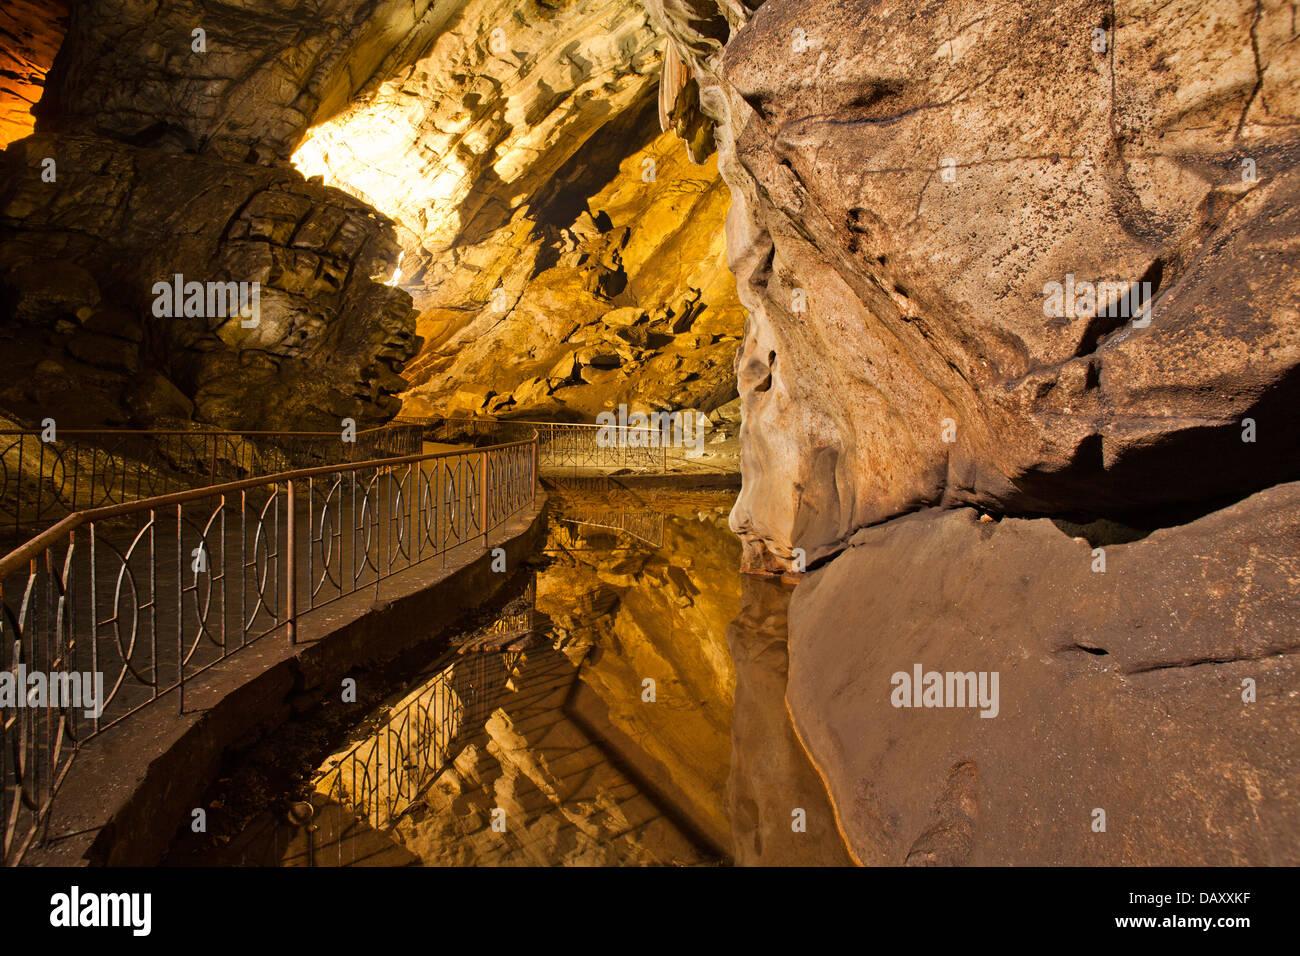 Araku borra caves photos Borra Caves - Wikipedia